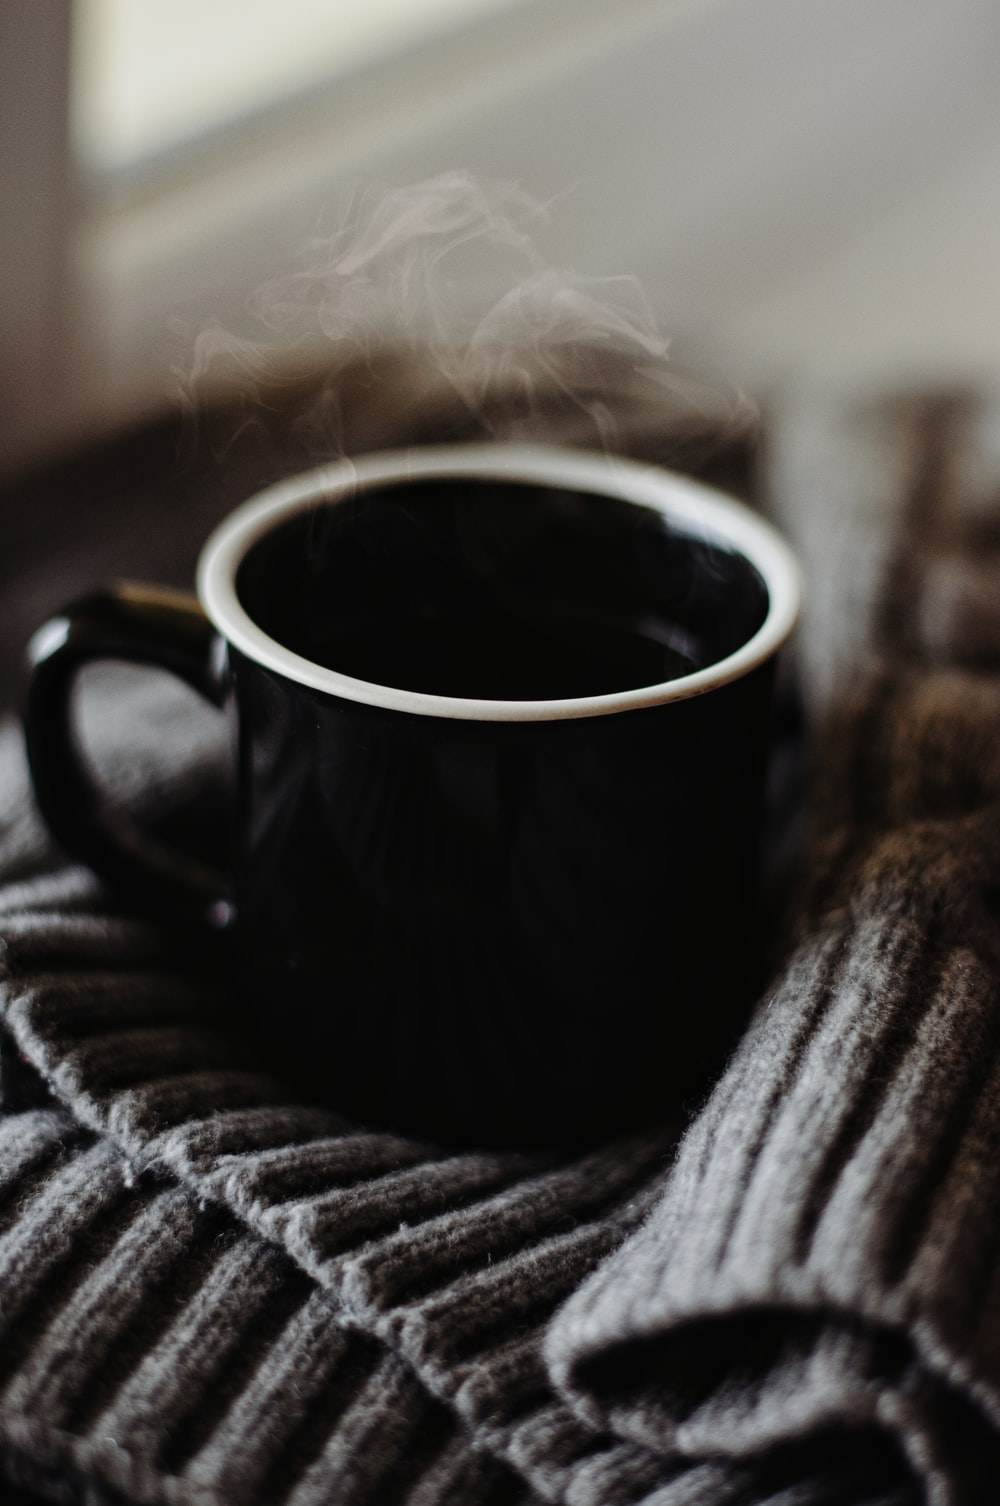 black and white ceramic mug on brown and black textile